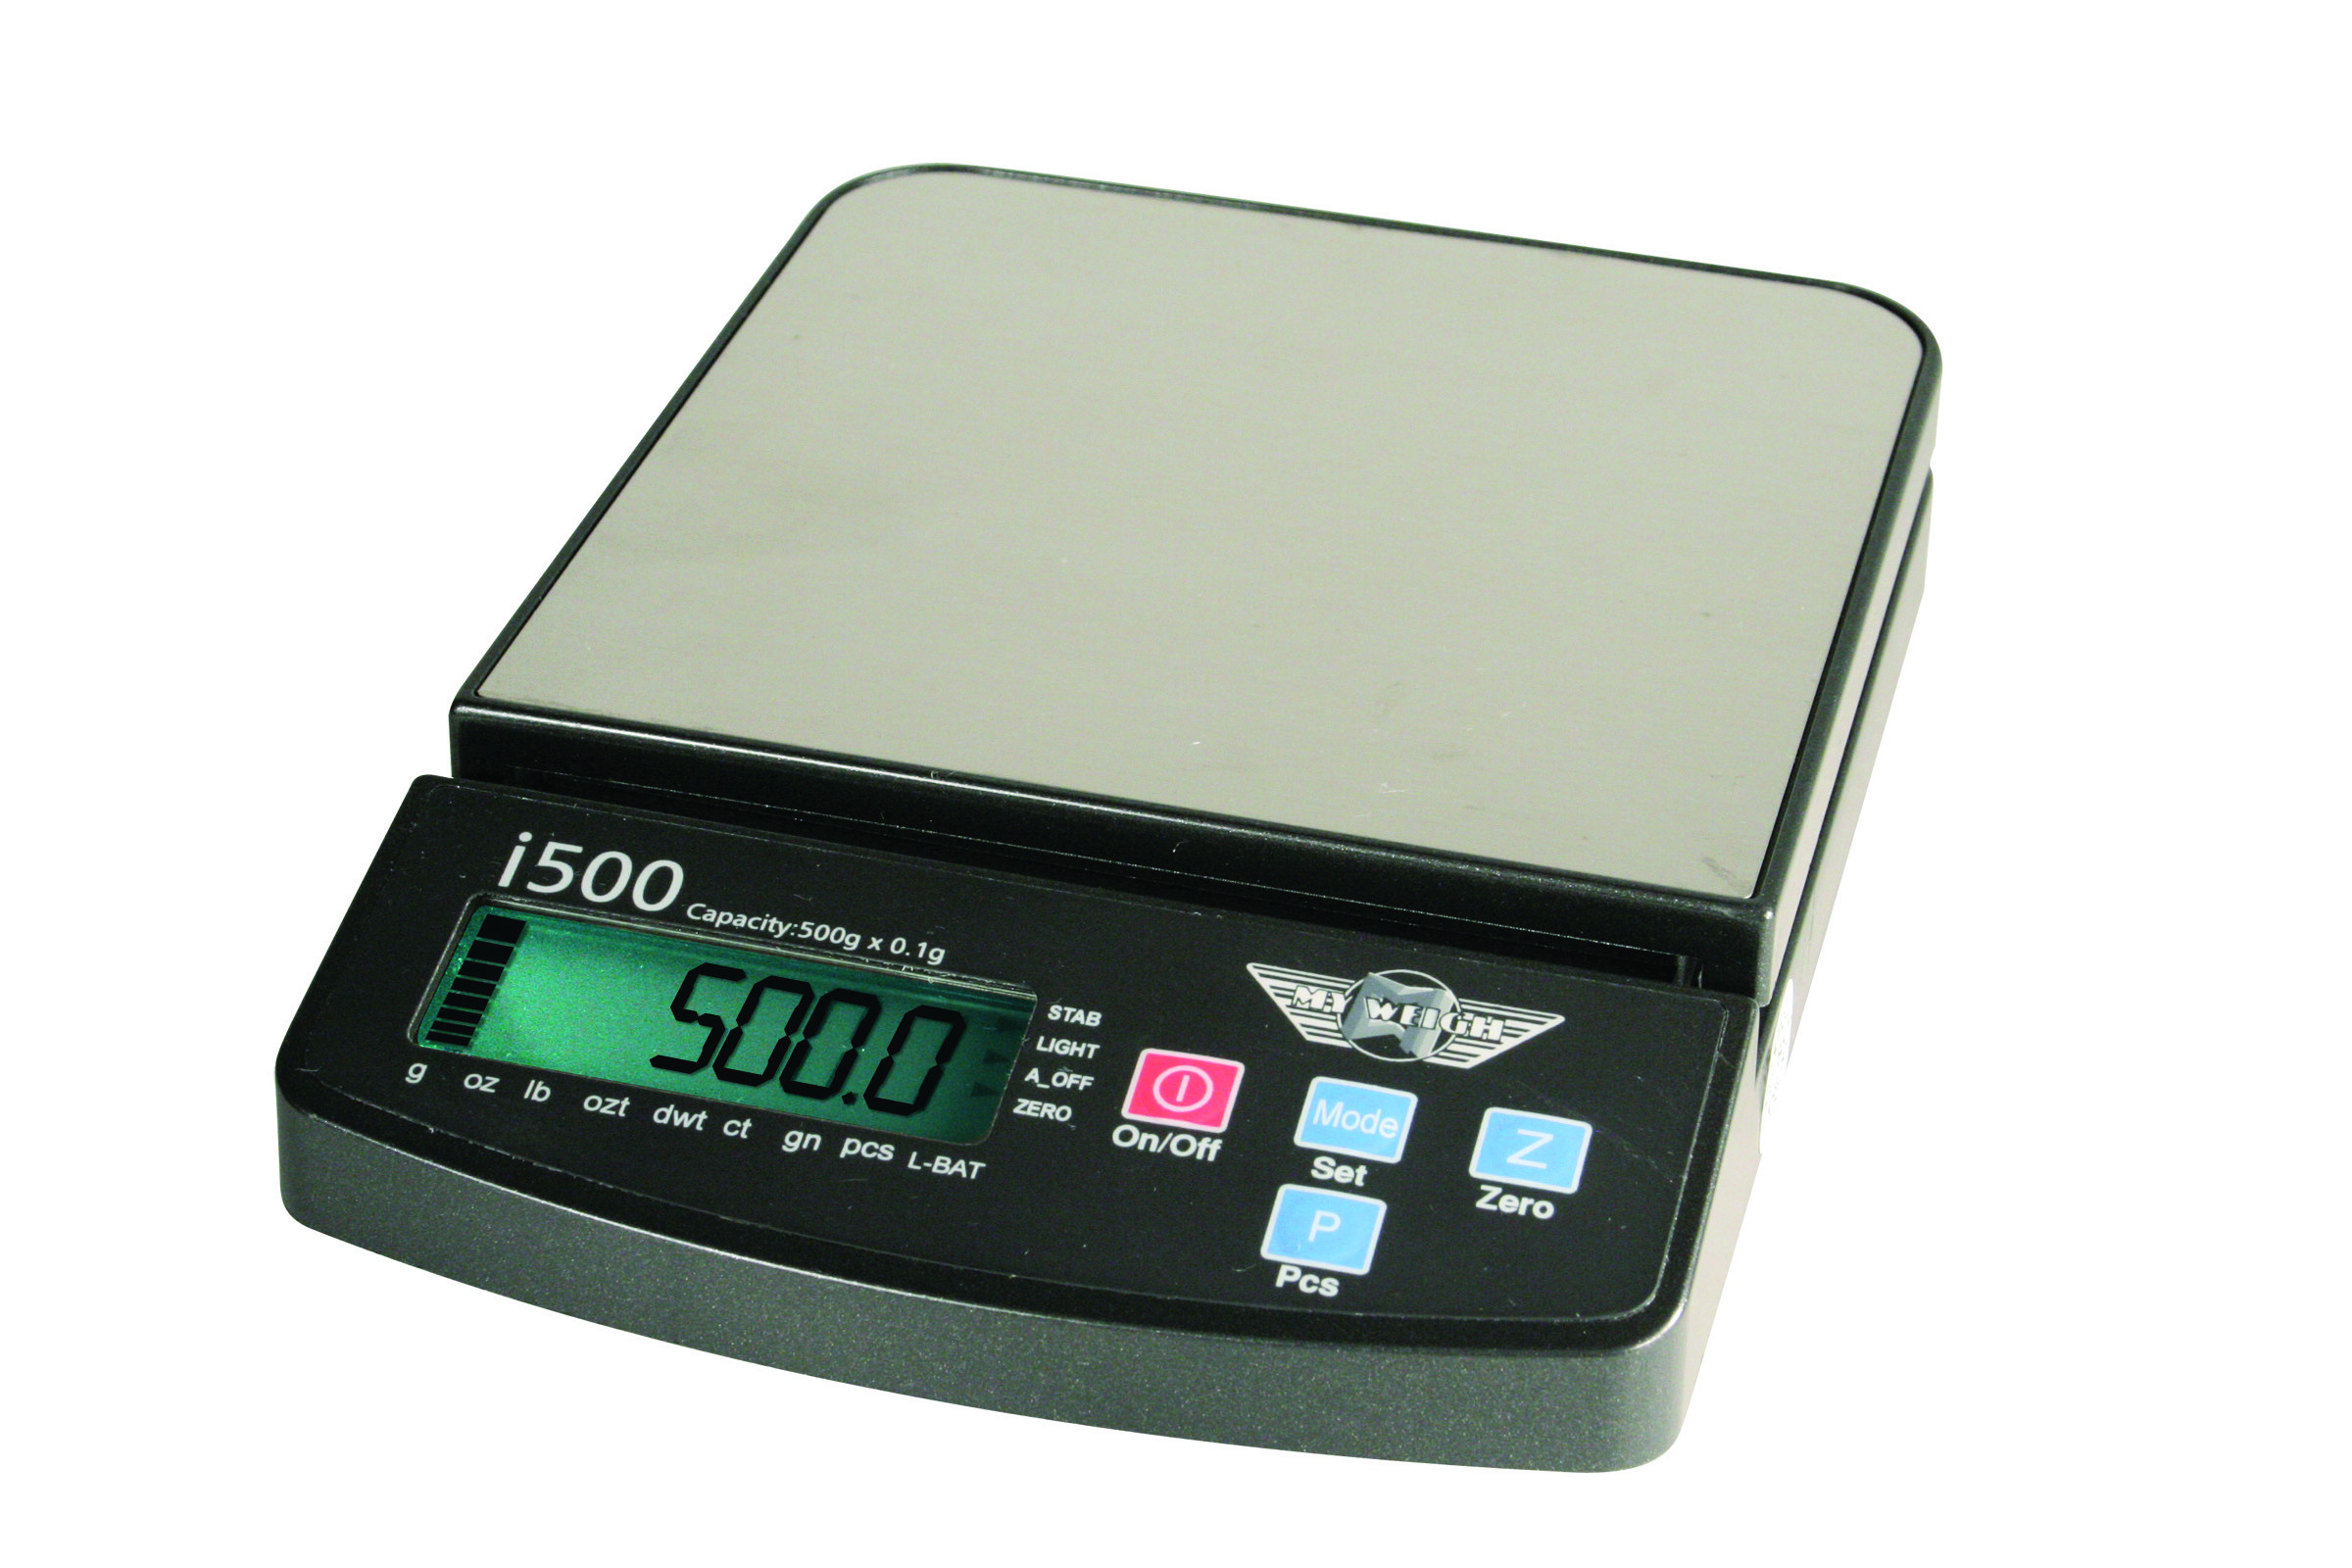 Præcision My Weigh iBalance 500 Vejeplade (145 x 145 mm) (500 gr. x 0.1 gr.)